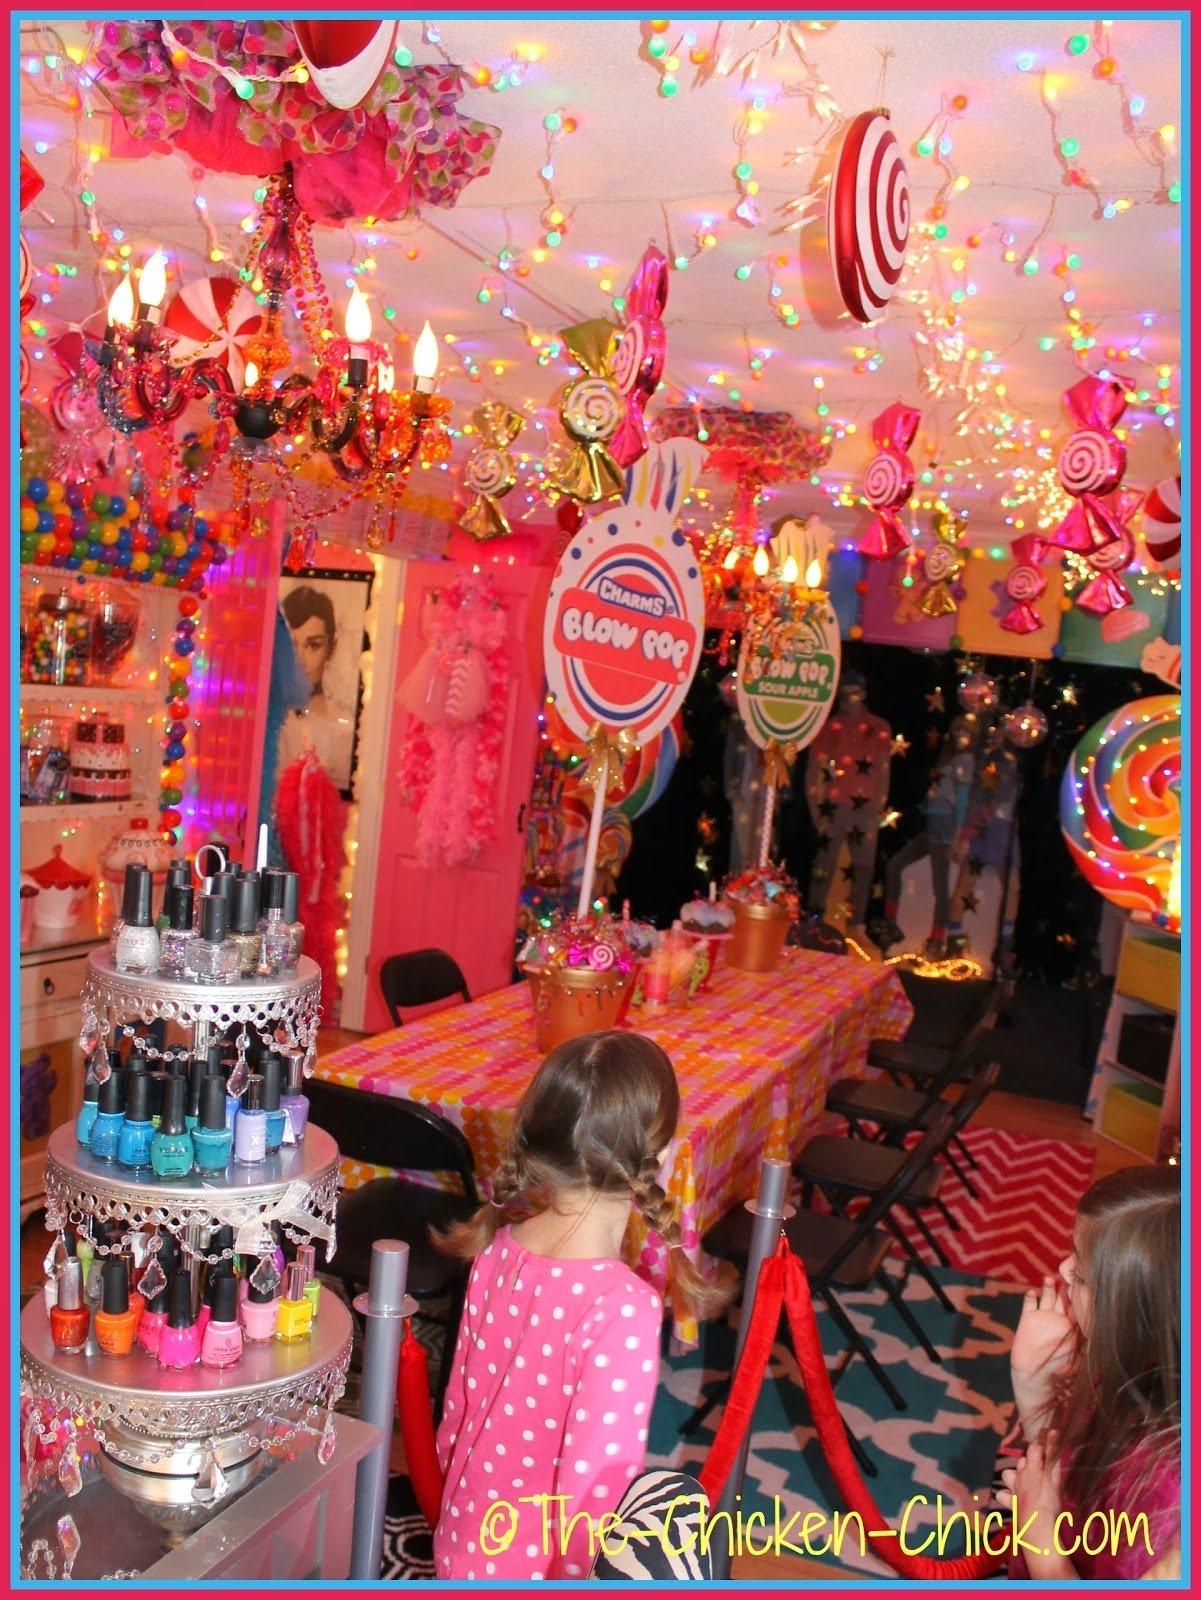 10 Pretty Birthday Party Ideas For 15 Yr Old Girl spa birthday party ideas for 7 year olds pool design ideas 4